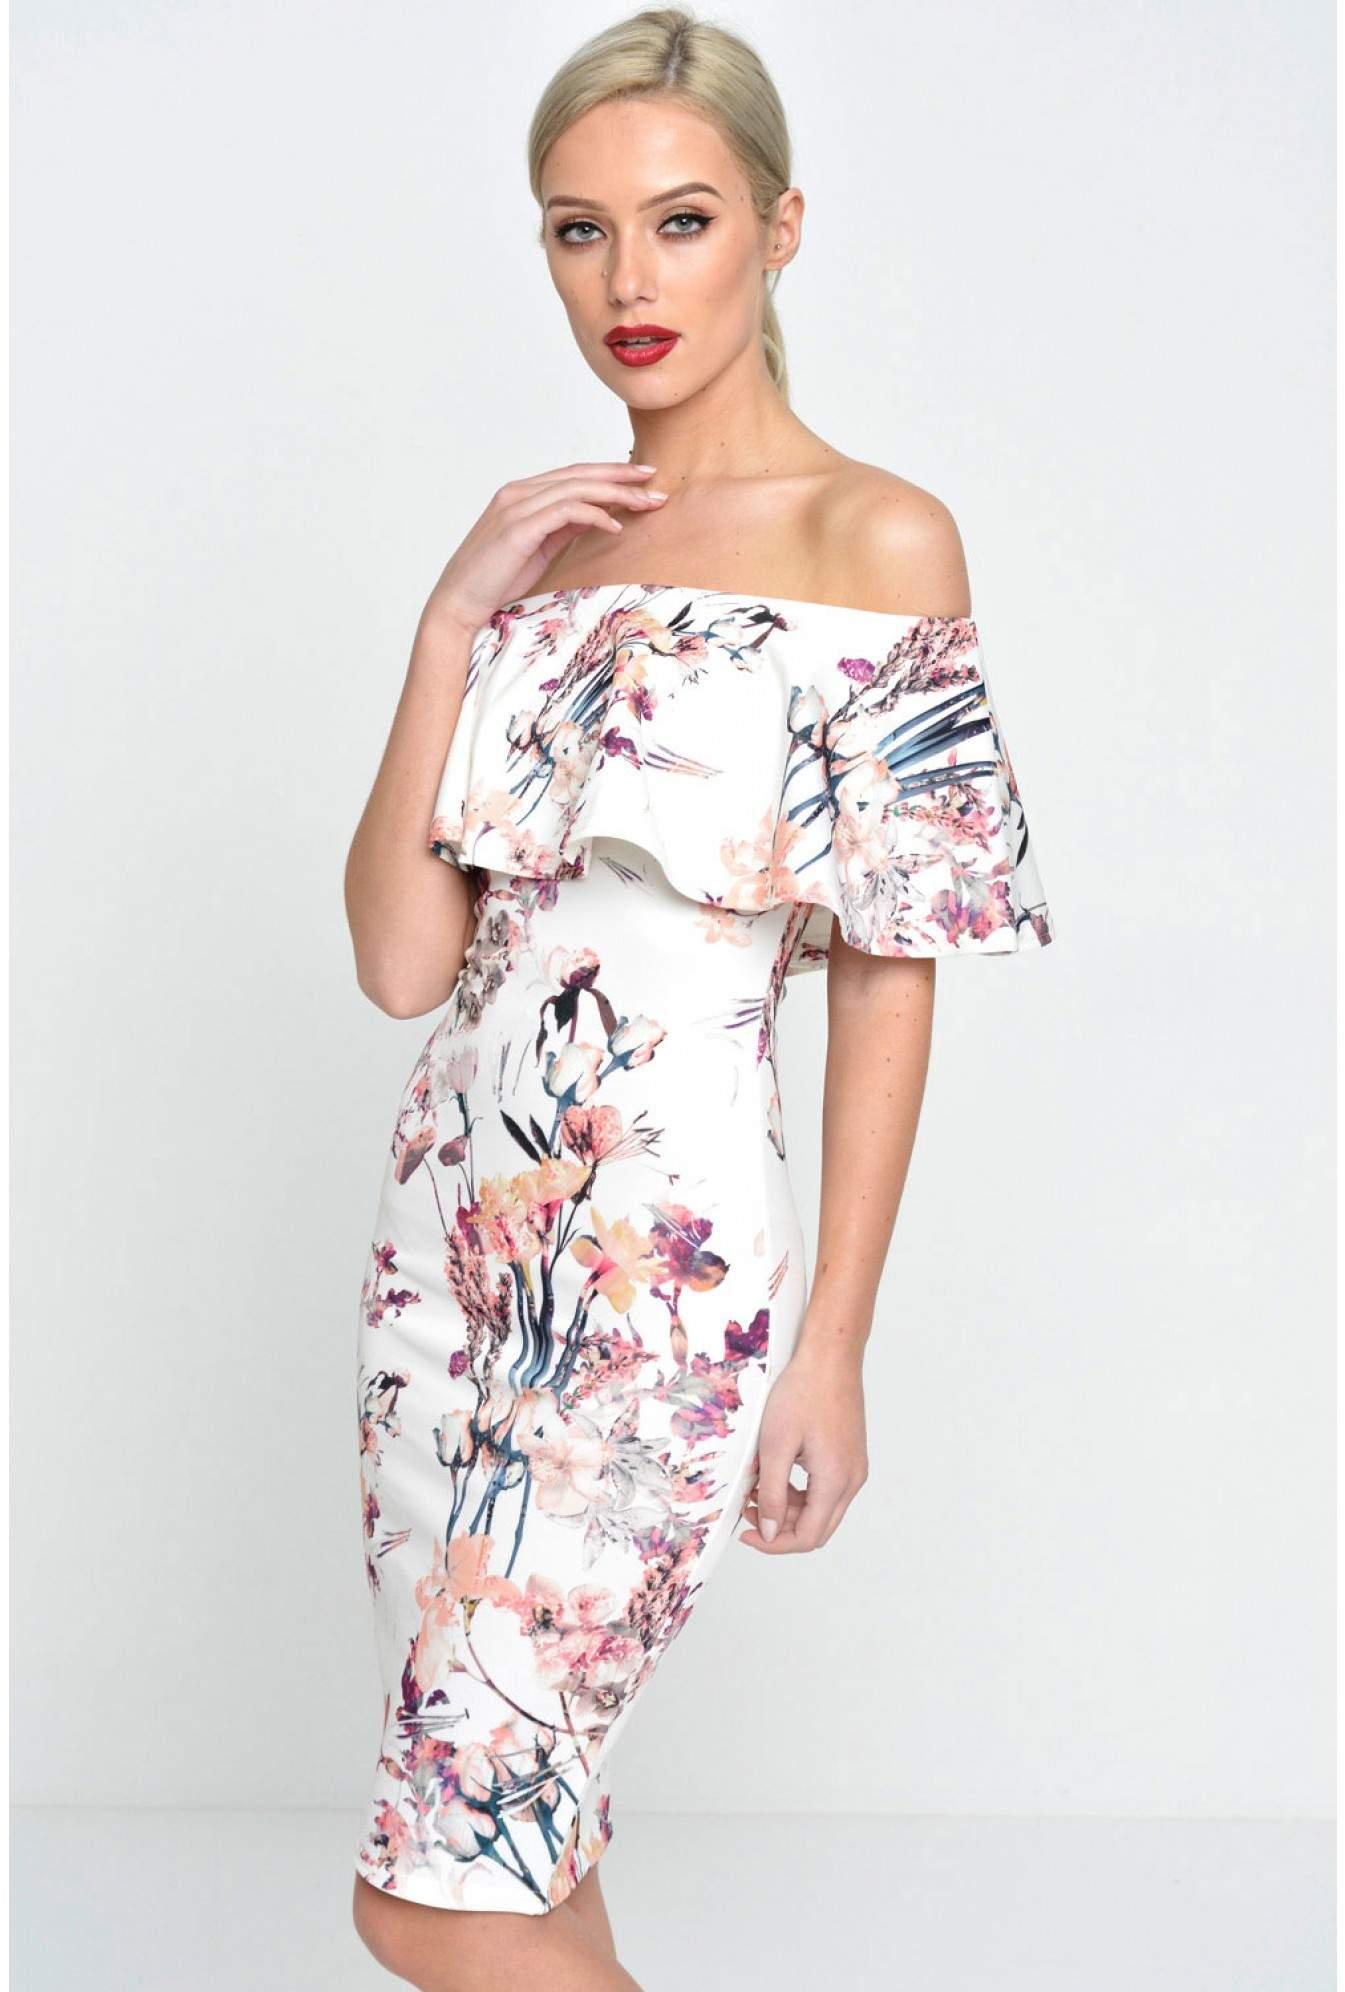 90c29c29cba6 Evita Philis Floral Off Shoulder Bodycon Dress in Cream | iCLOTHING